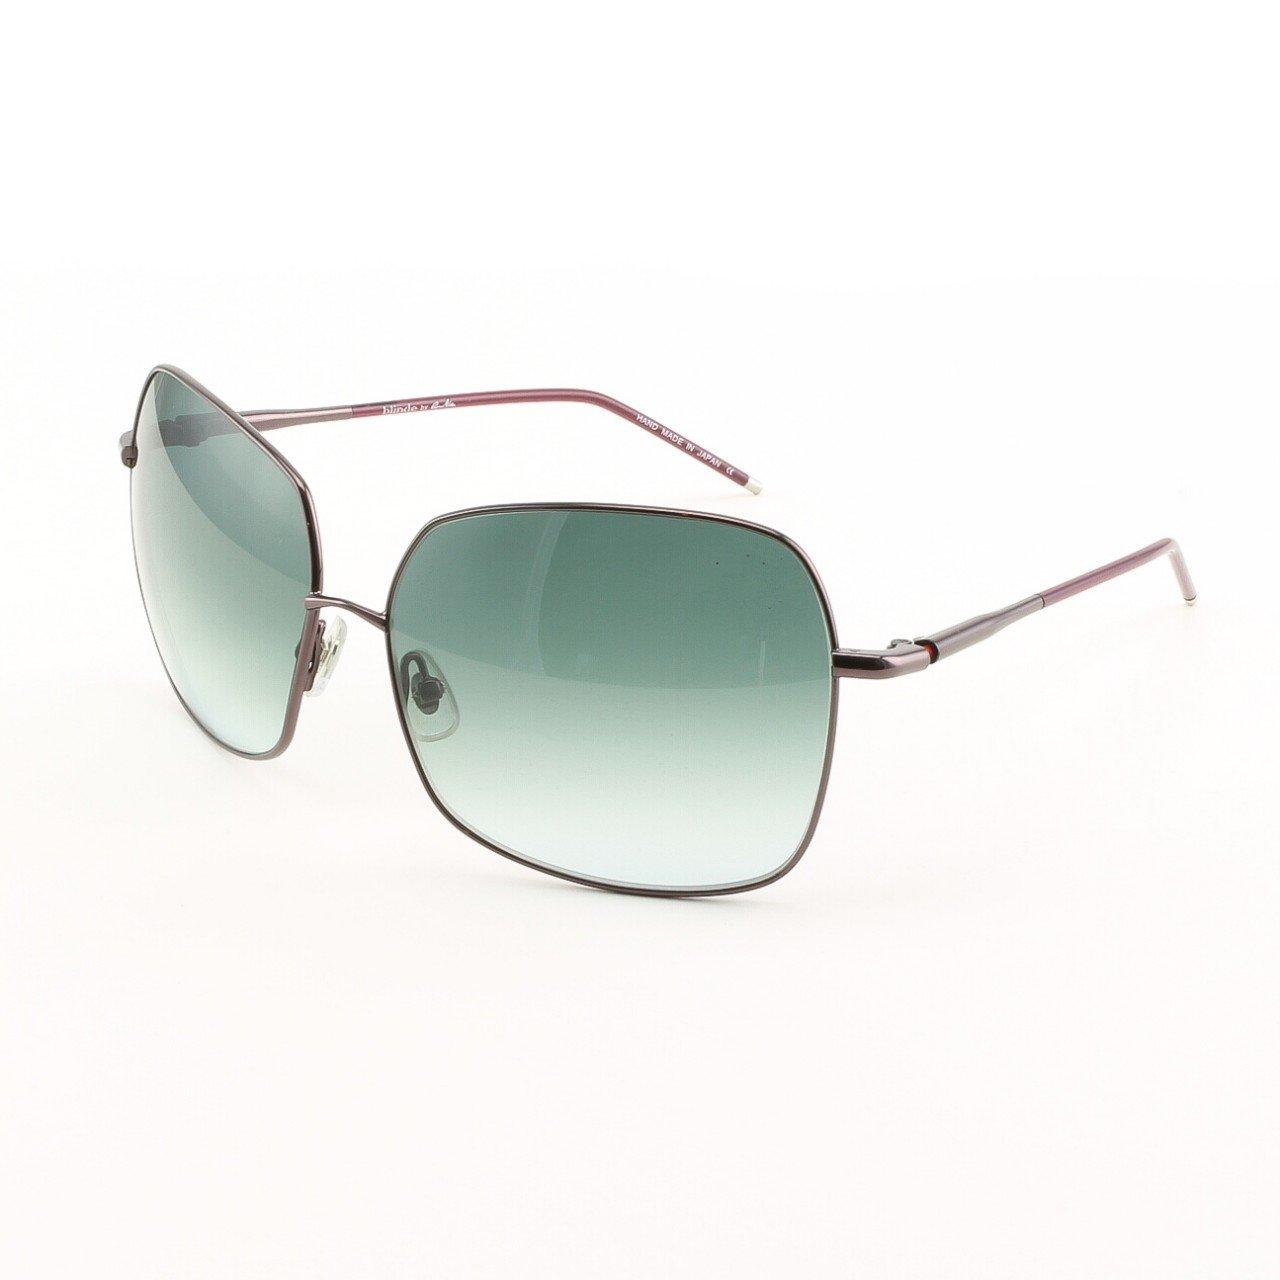 Blinde Lemme Guess Unisex Sunglasses Col. Black Cherry with Grey Lenses